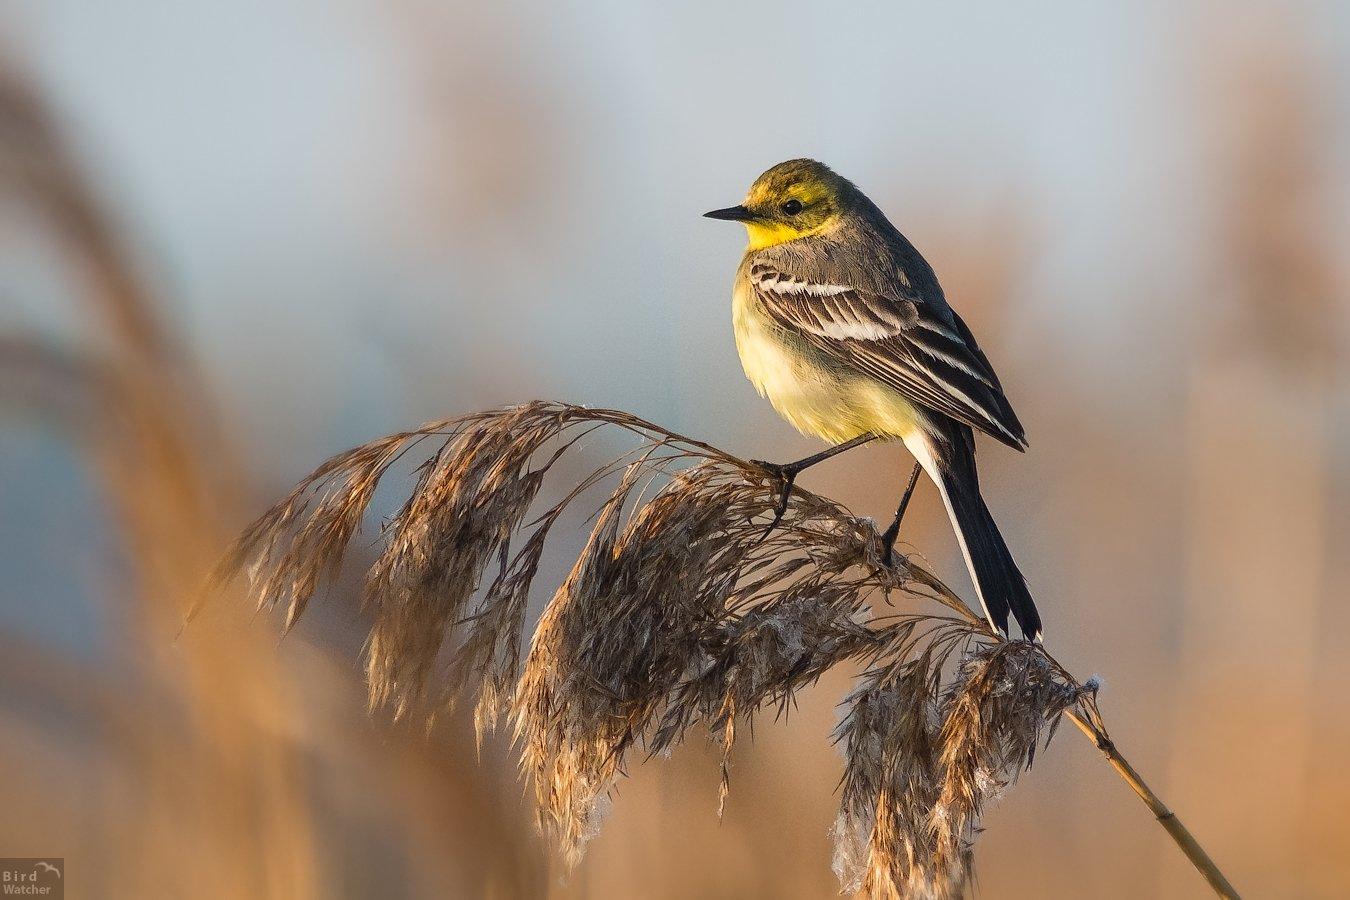 bird, Citrine wagtail, Motacilla citreola, Желтоголовая трясогузка, birds, Nature, Bird Watcher